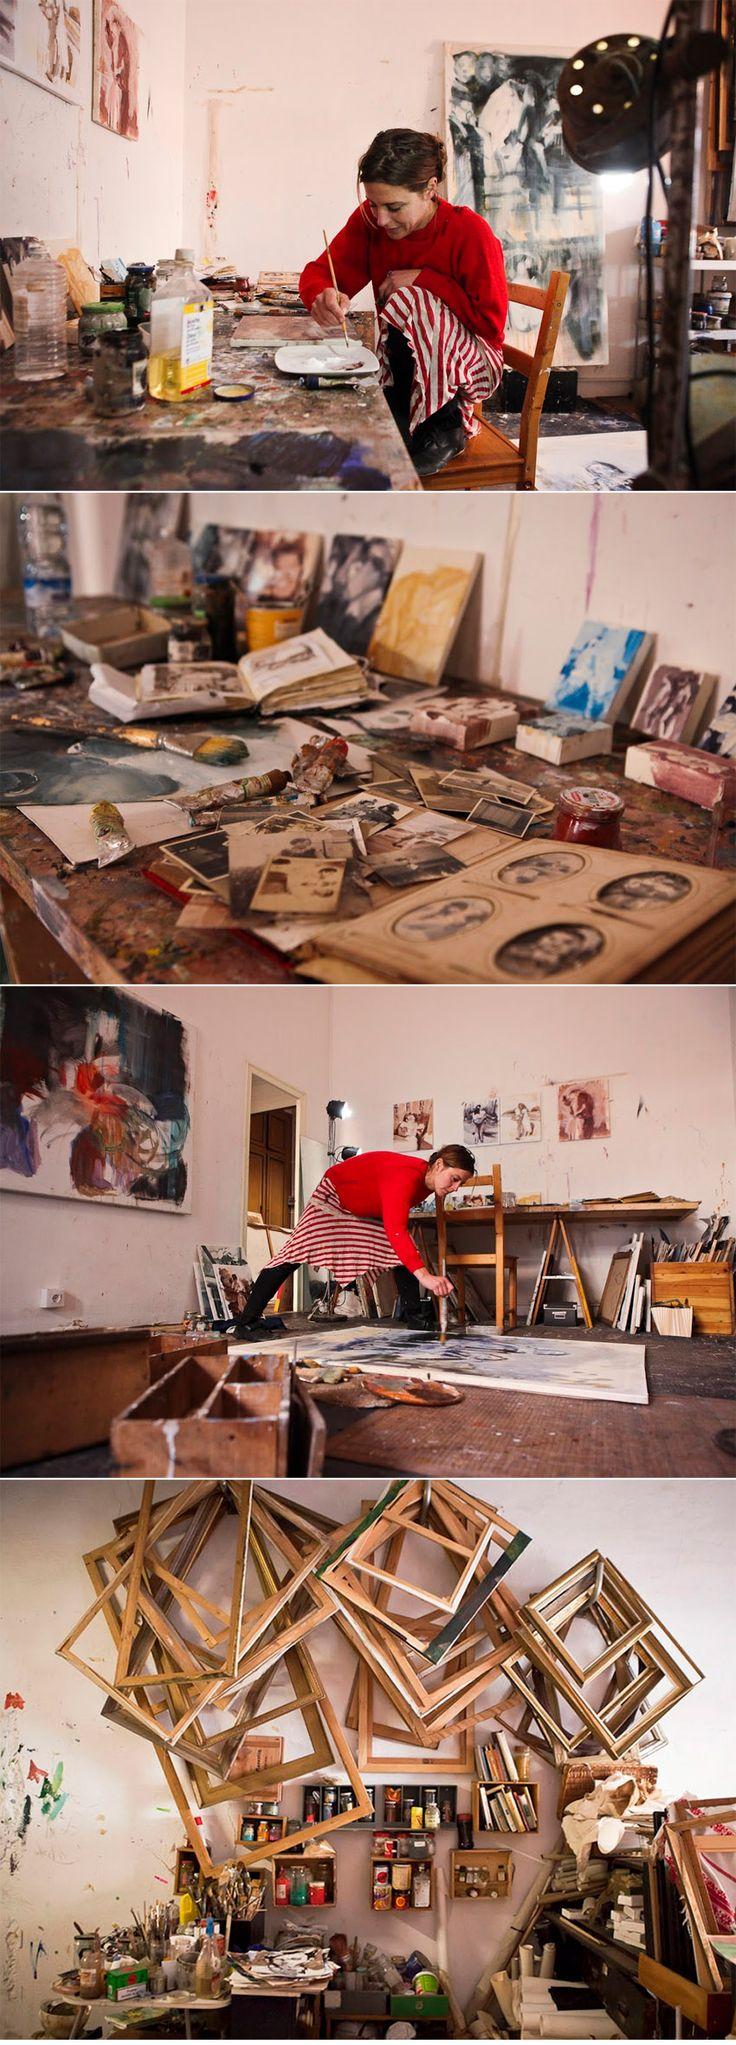 Inside The Studio: Anna McNeil http://magazine.saatchiart.com/articles/artnews/saatchi-art-news/inside-the-studio-saatchi-art-news/anna-mcneil